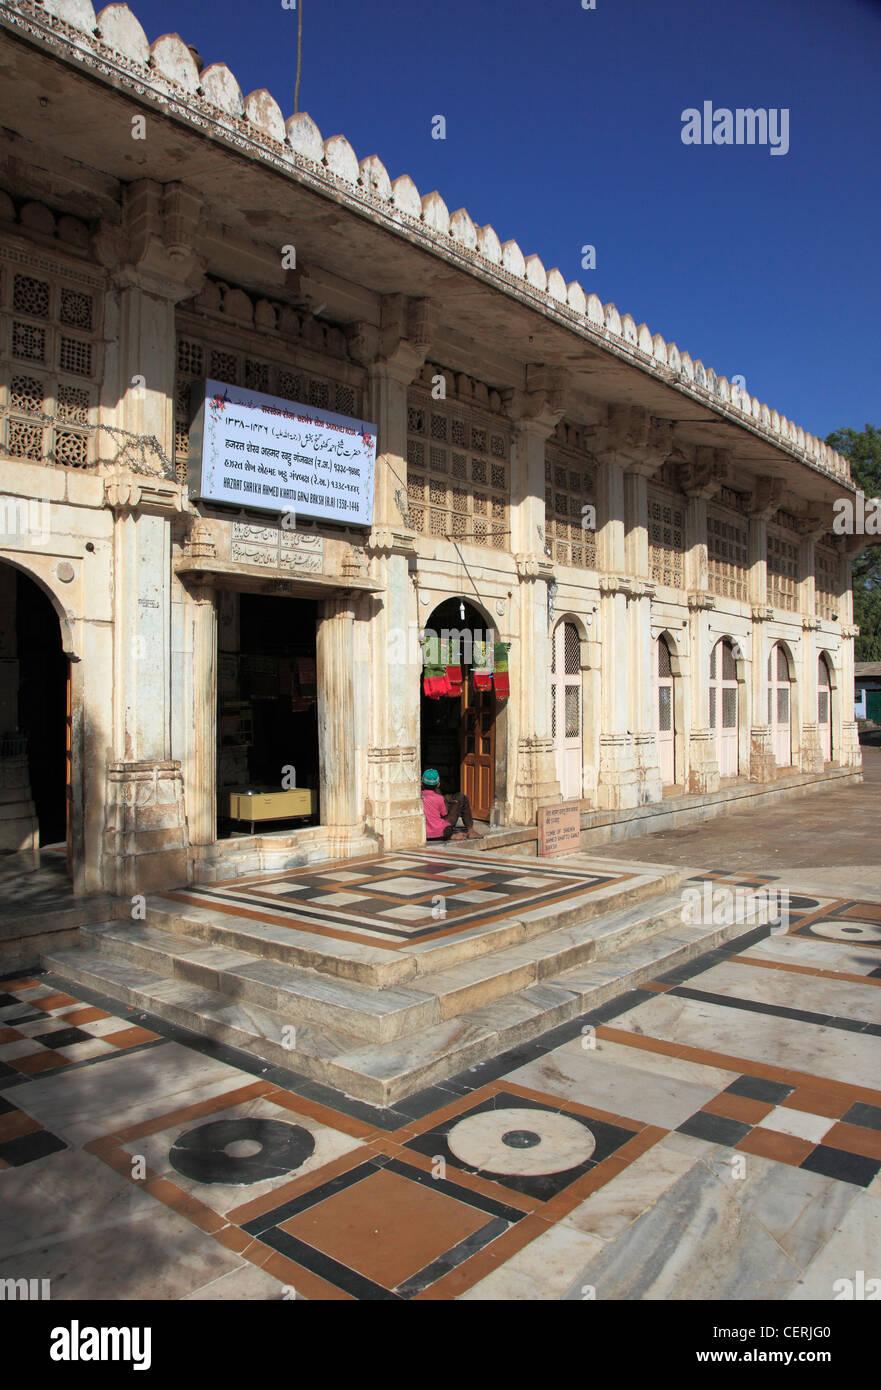 India, Gujarat, Ahmedabad, Sarkhej Rosa, Tomb of Sheikh Ahmed Khattu Ganj Baksh, - Stock Image